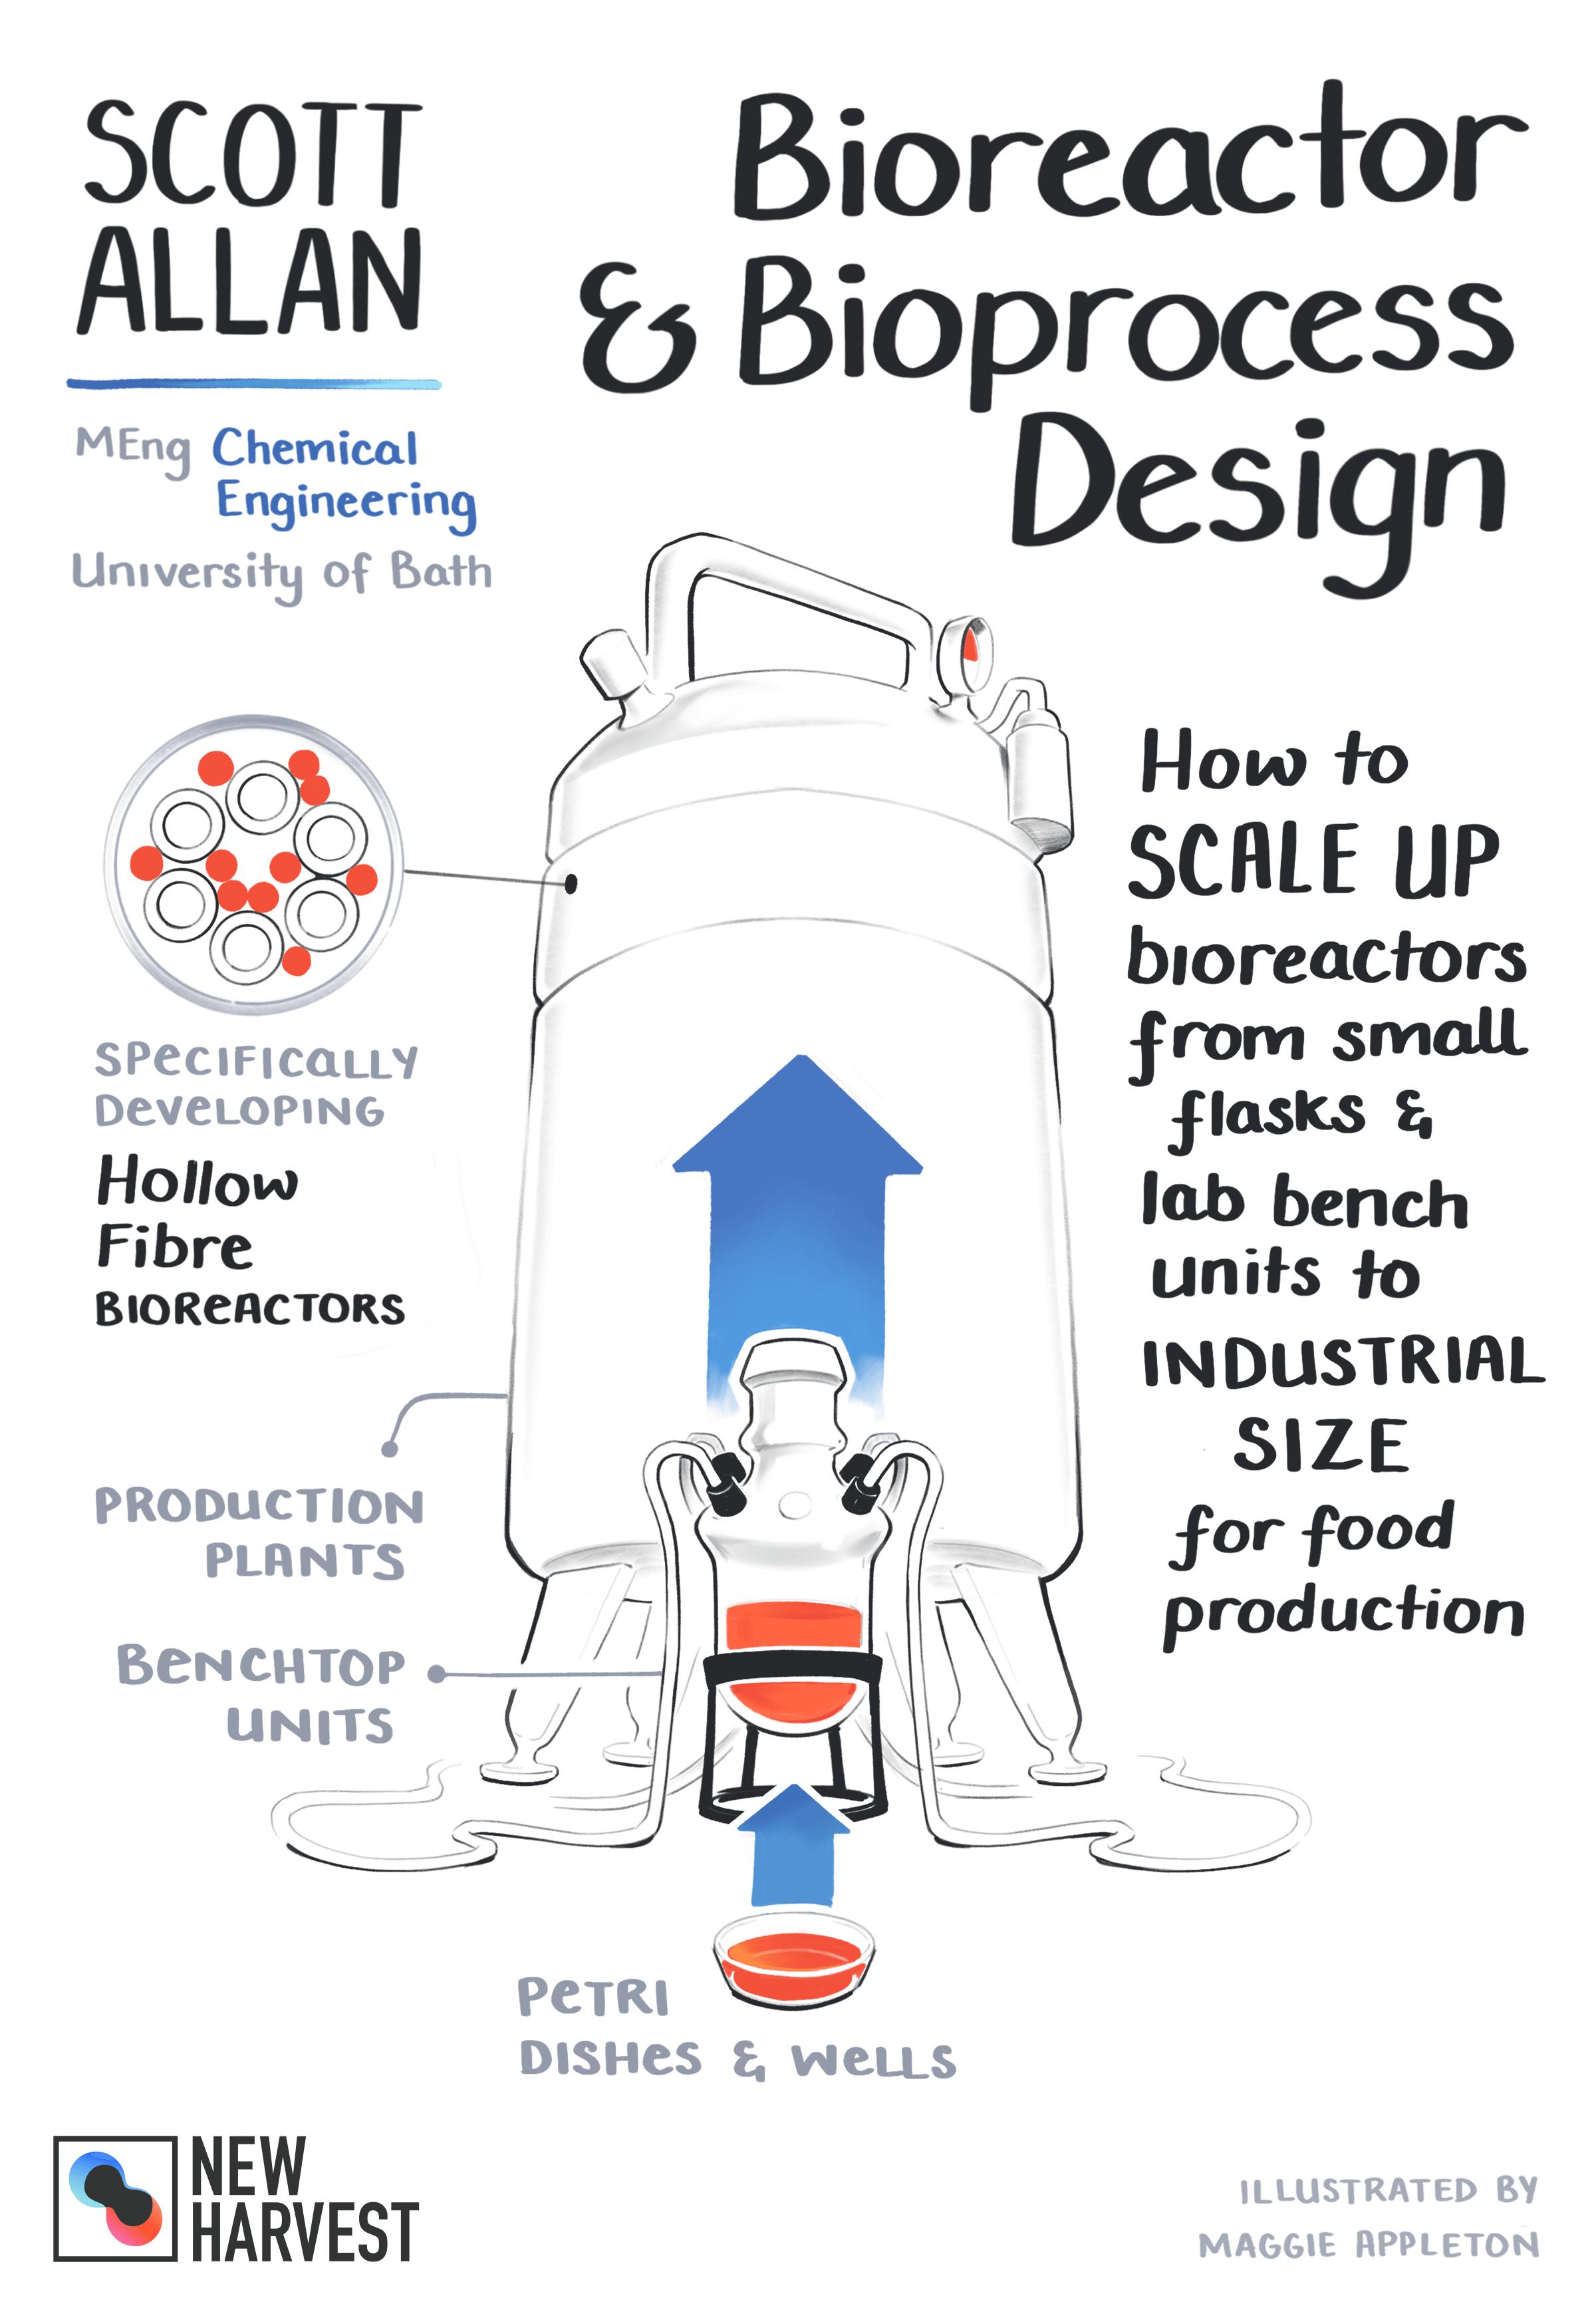 Diagram of the bioreactor and bioprocess described by Scott Allen